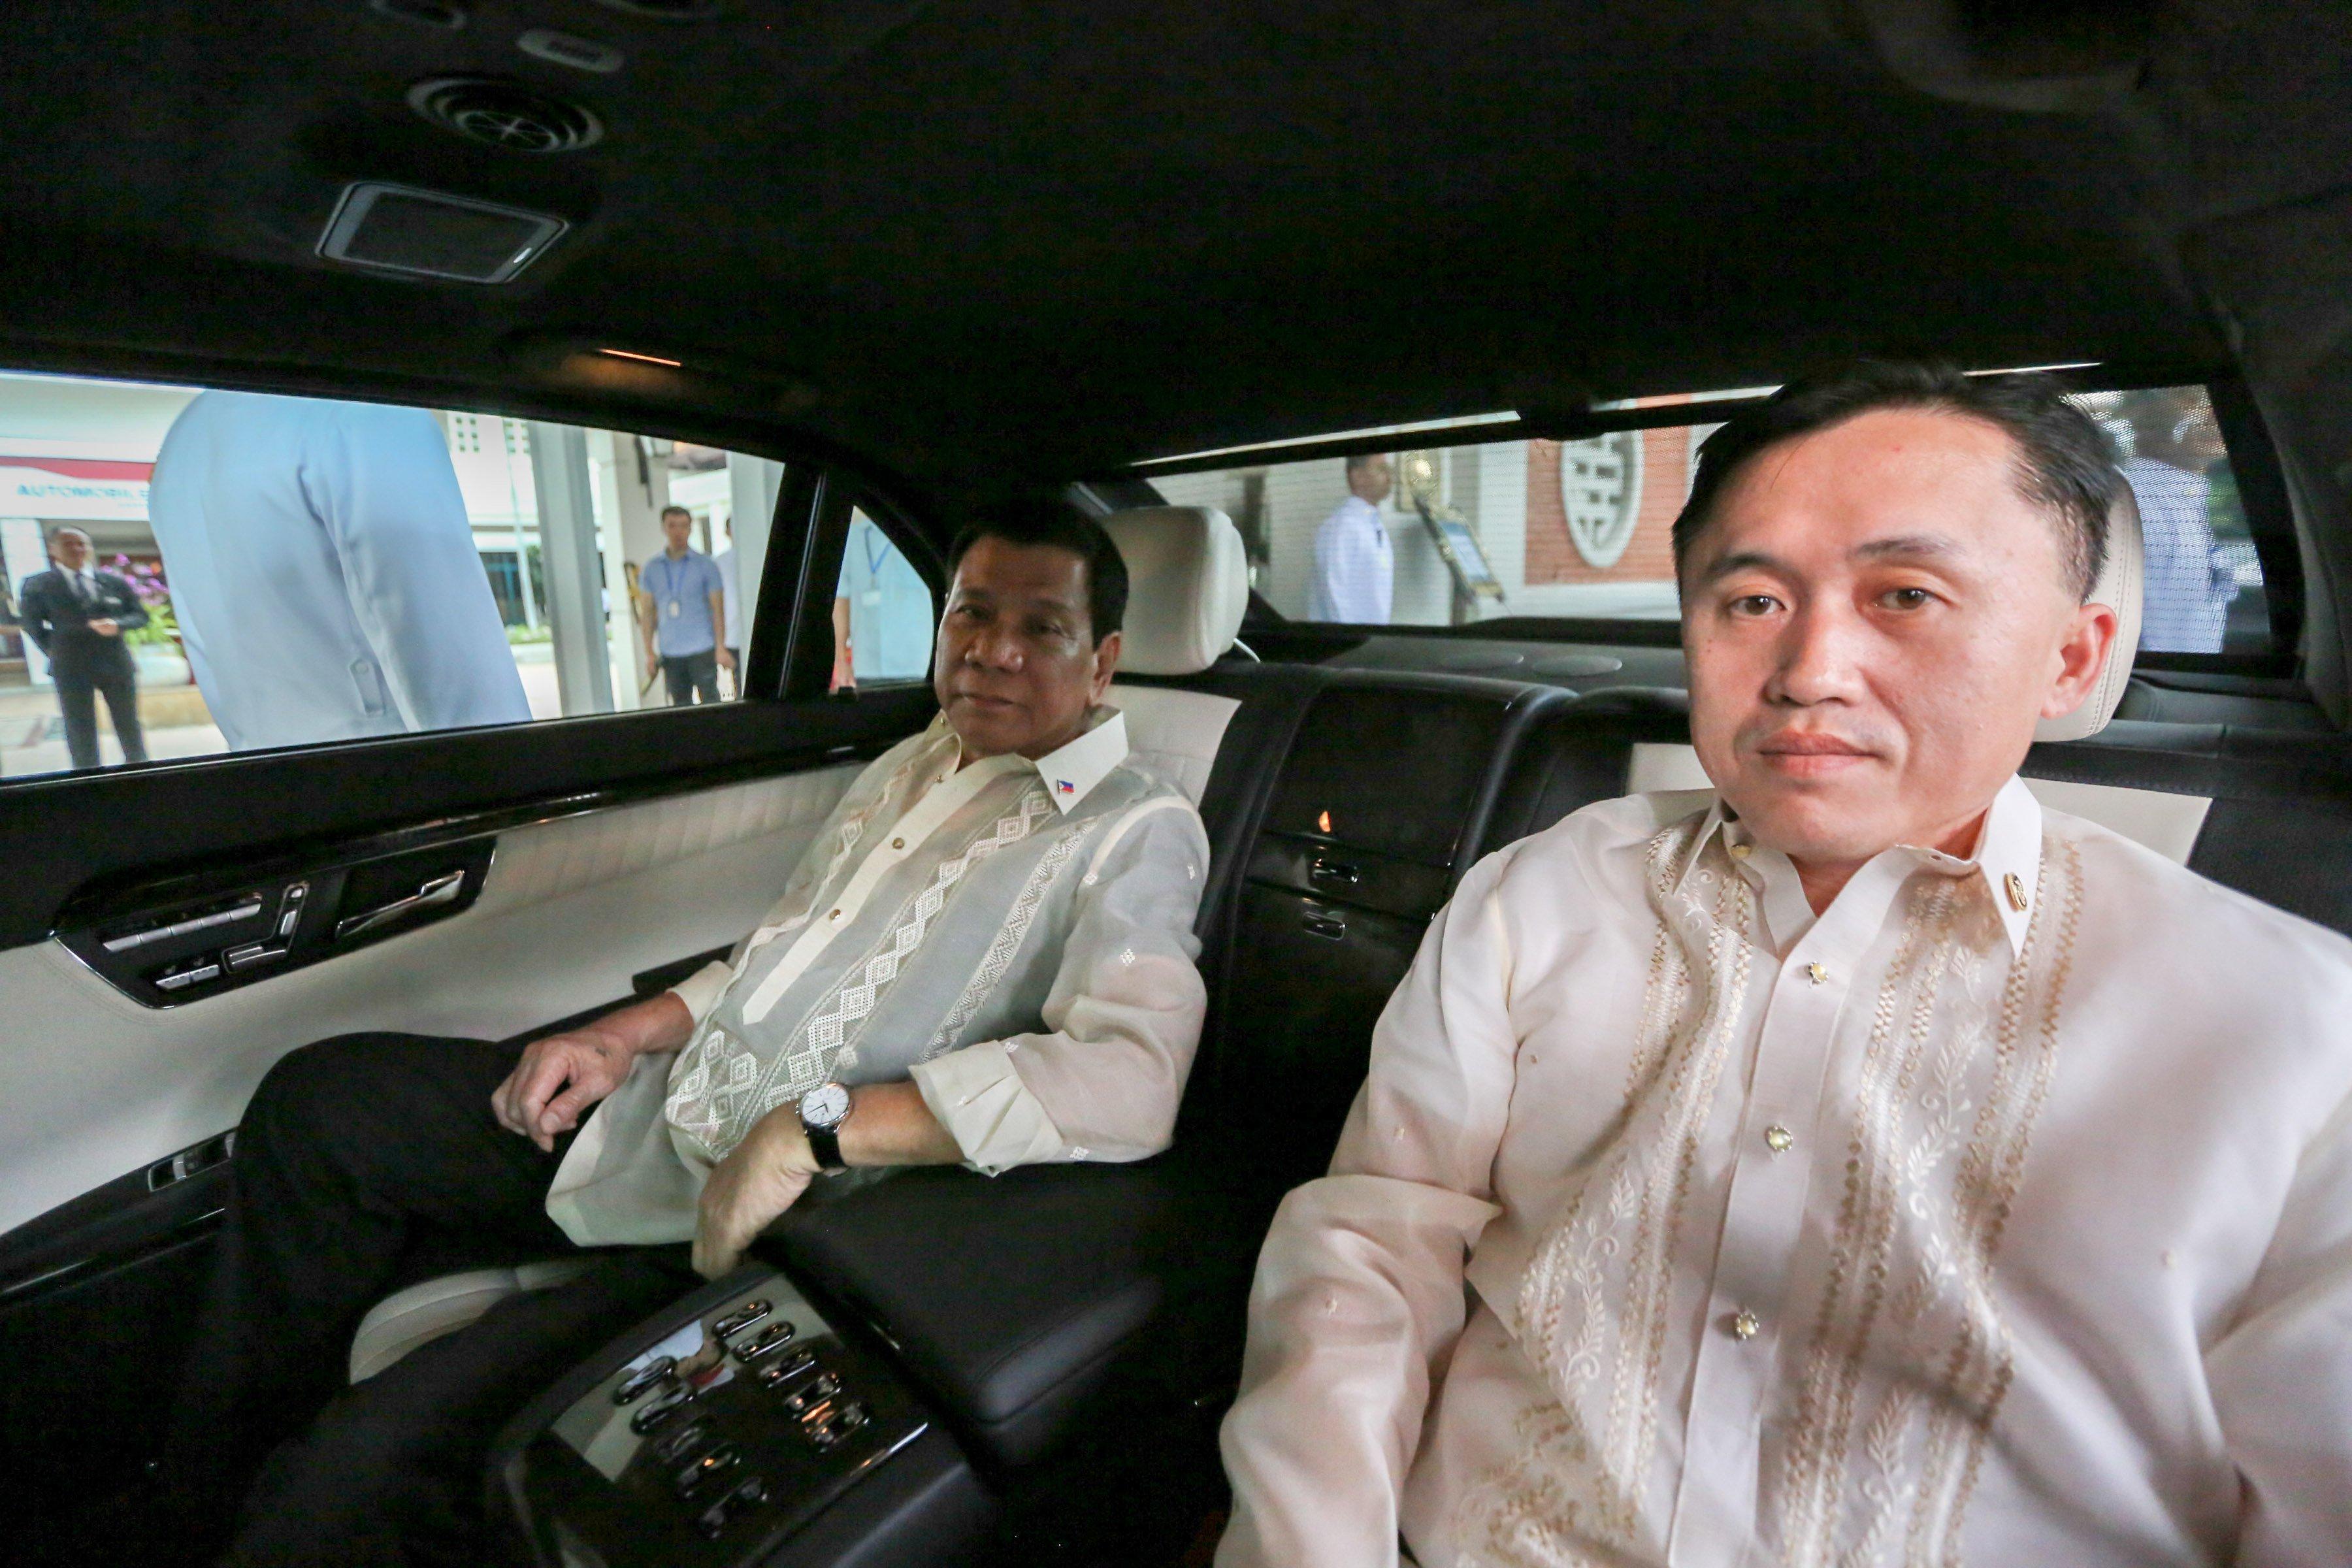 Duterte to auction off luxury car